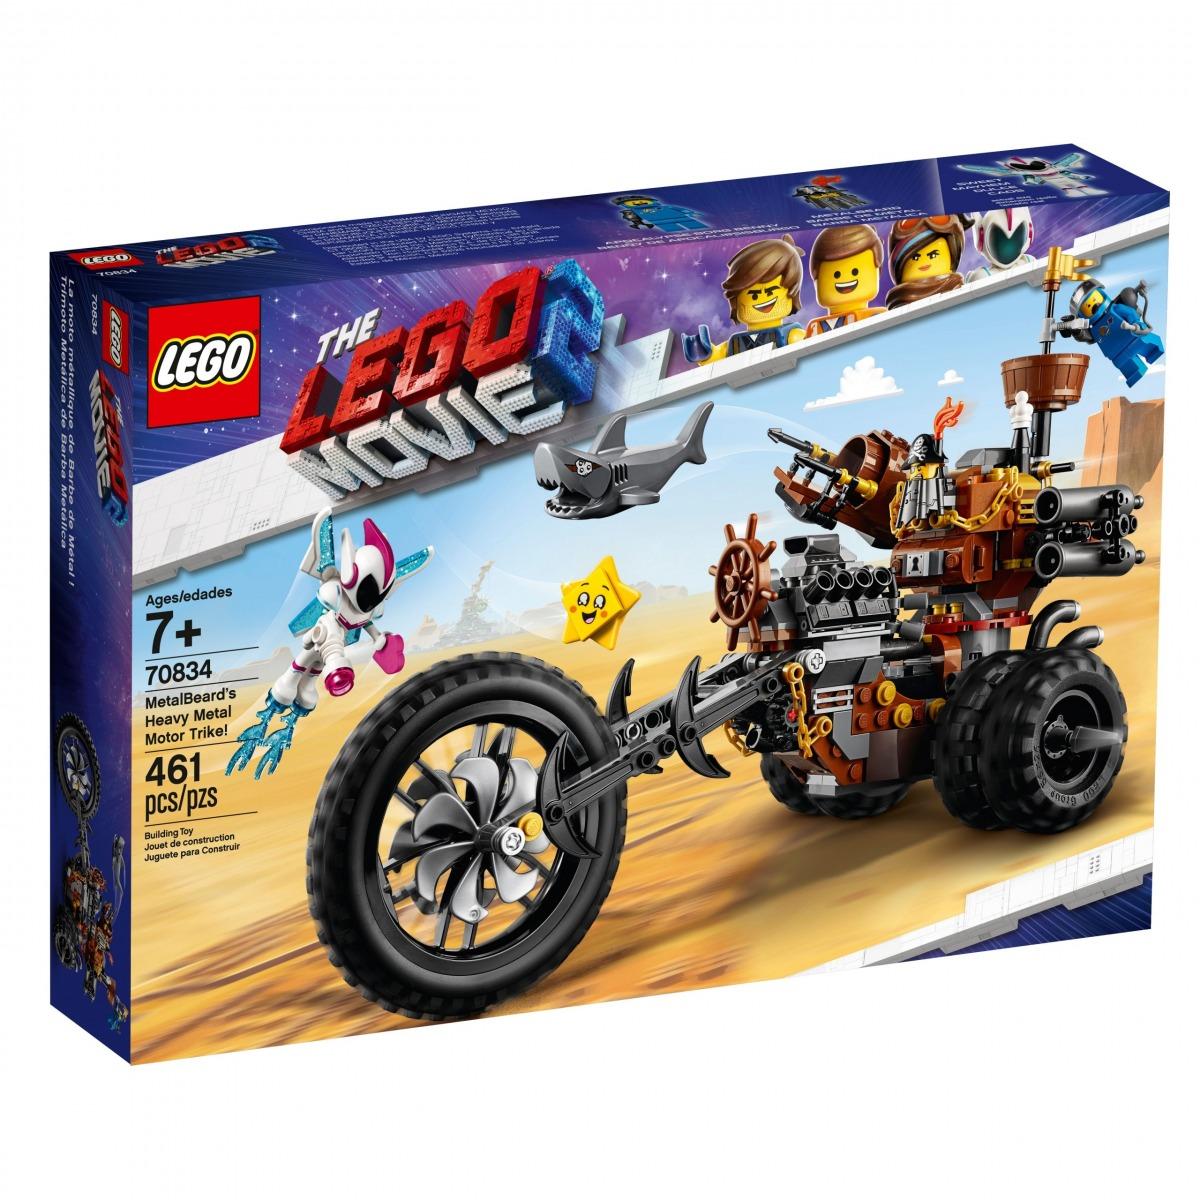 lego 70834 metalbeards heavy metal motor trike scaled